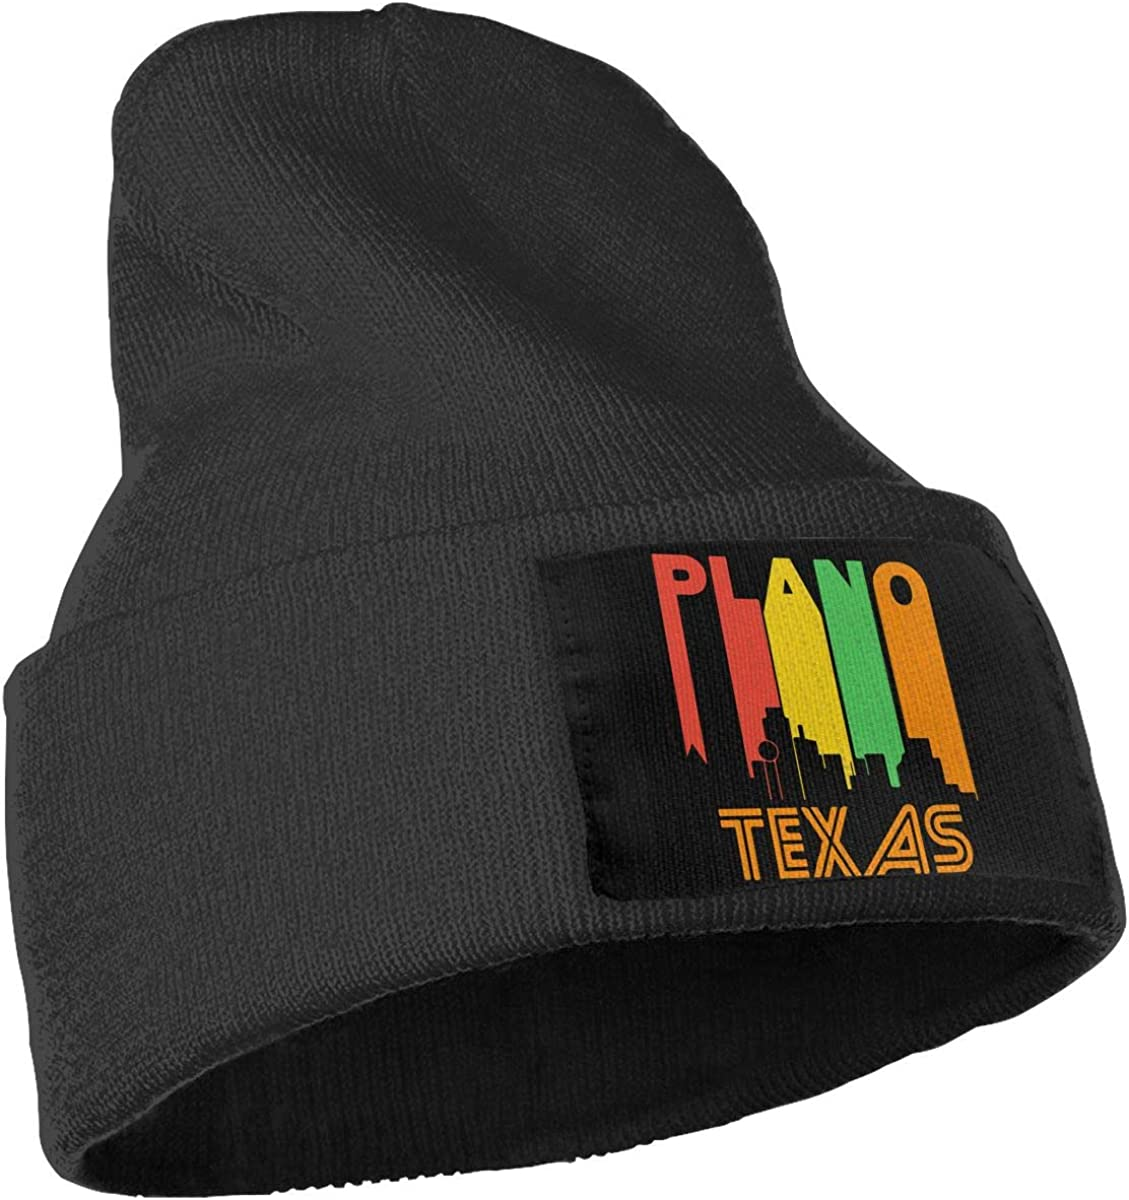 Retro 1970s Style Plano Texas Skyline Beanie Cap Hat Men /& Women Knit Hats Stretchy /& Soft Beanie